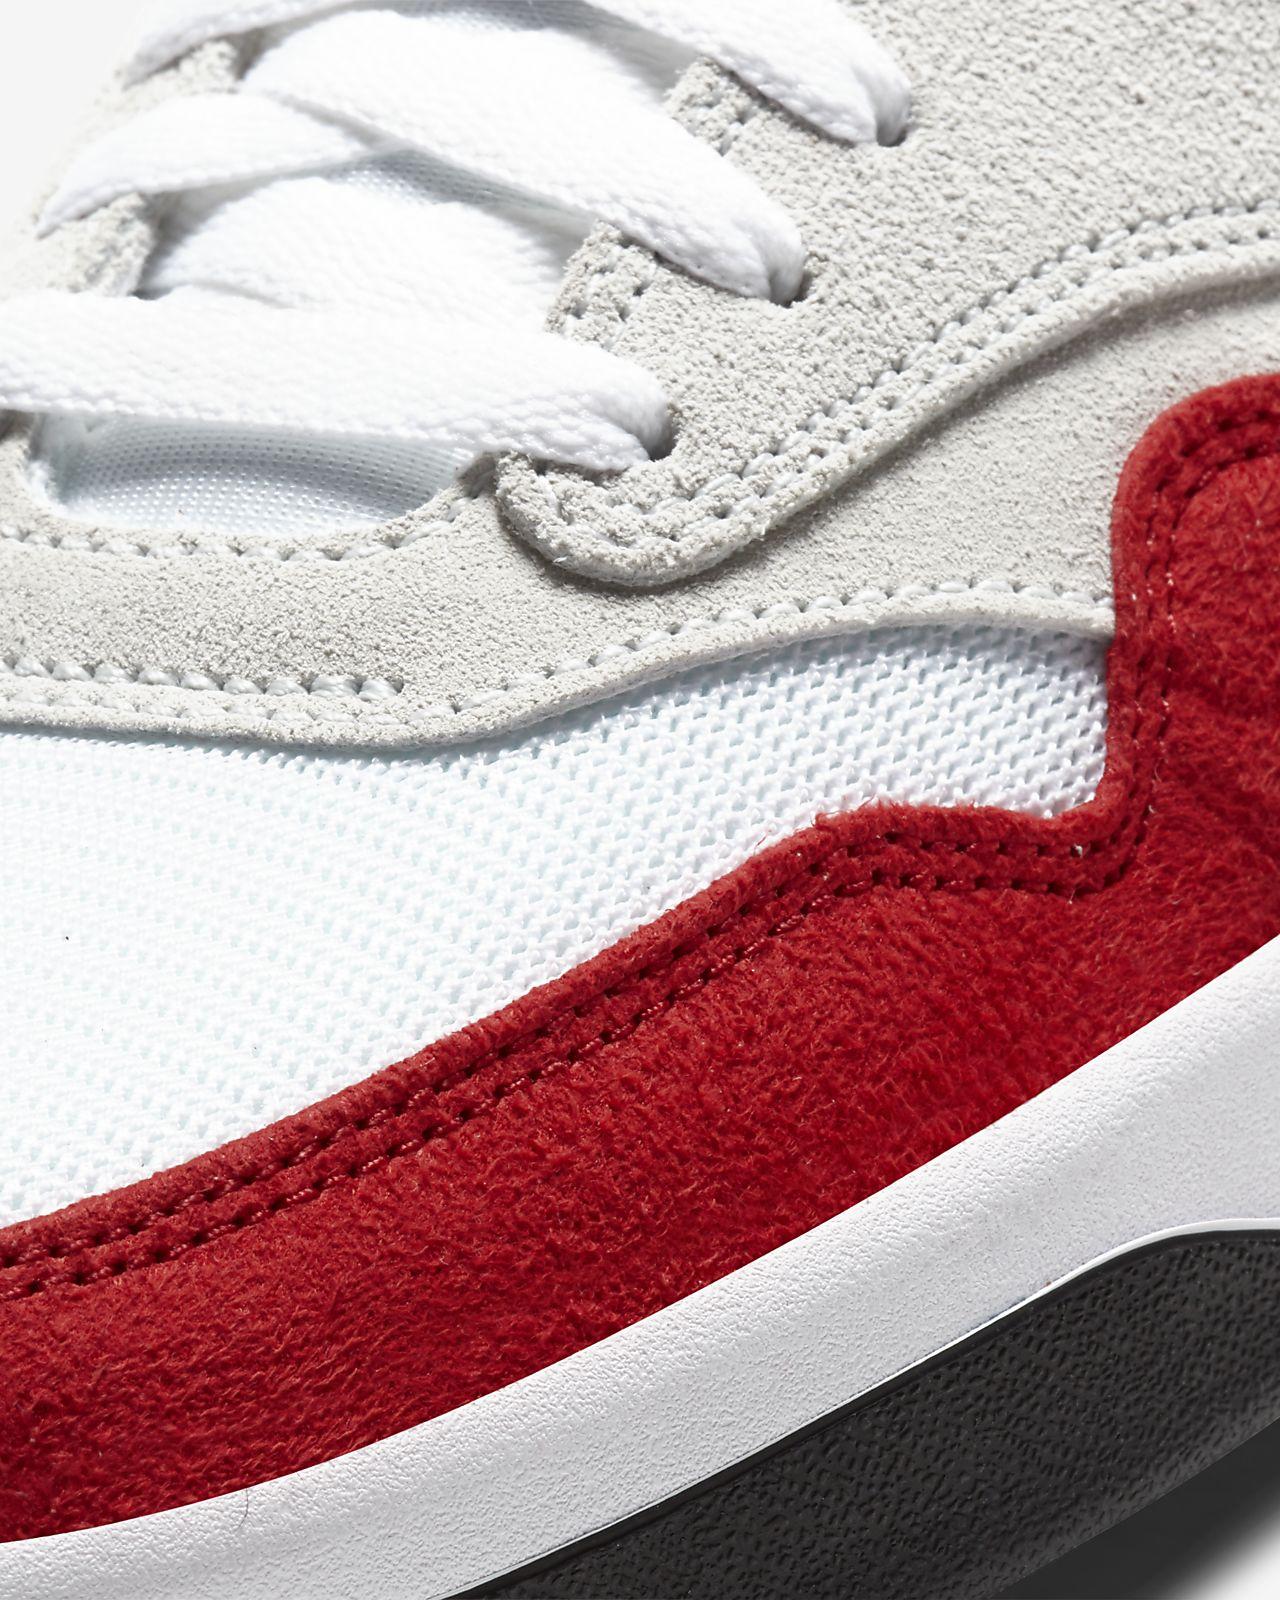 wholesale outlet meet amazing price Chaussure de skateboard Nike SB GTS Return Premium. Nike CA